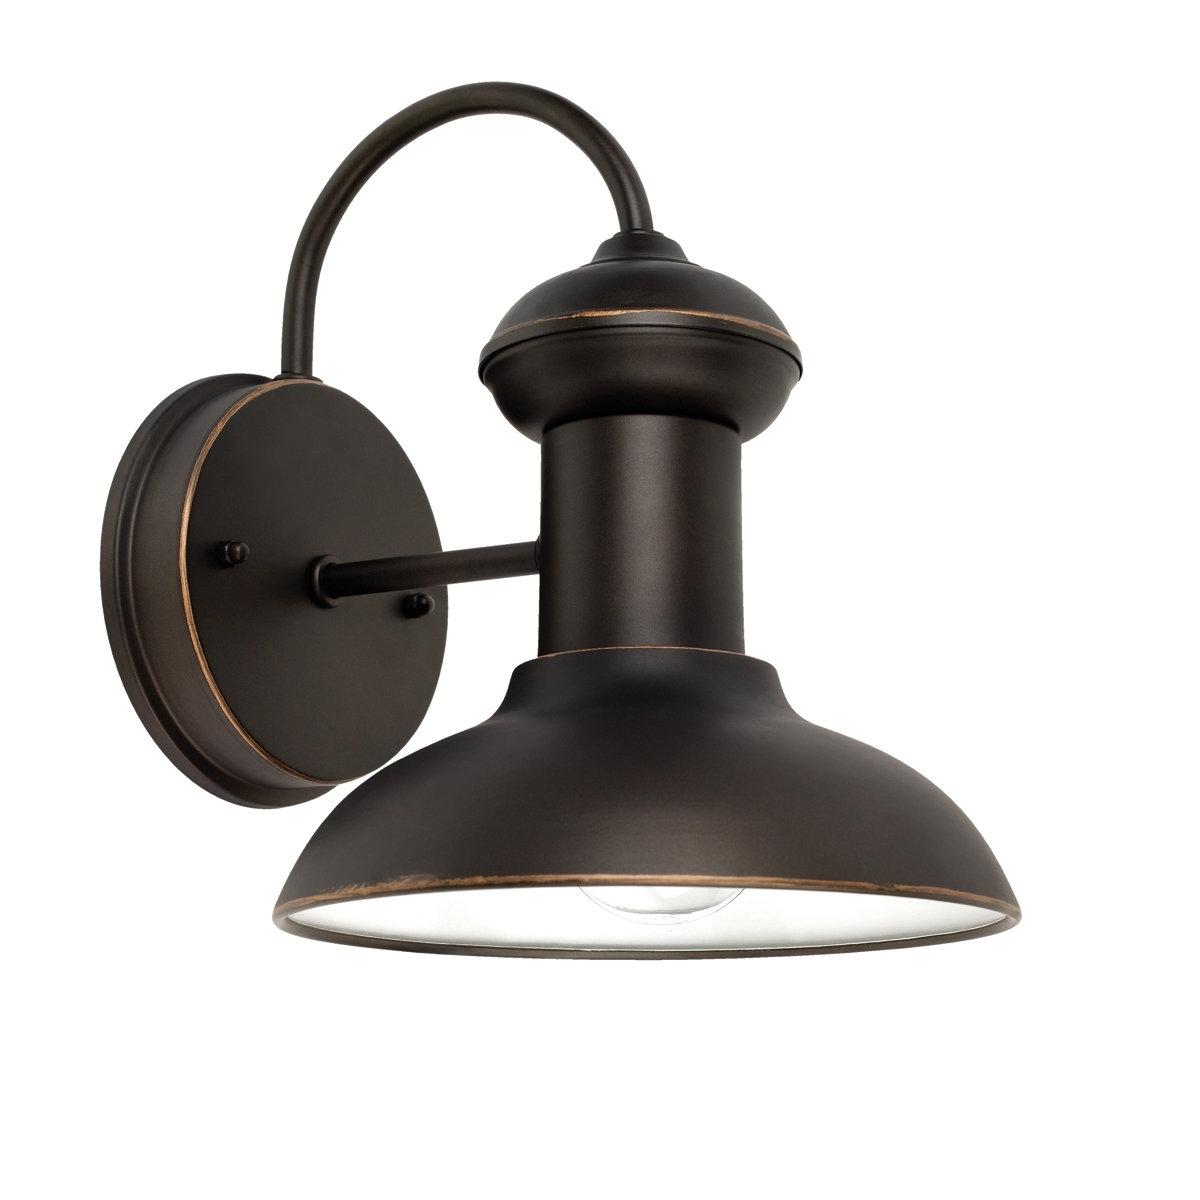 Wayfair For Well Known Modern Rustic Outdoor Lighting Att Wayfair (View 17 of 20)